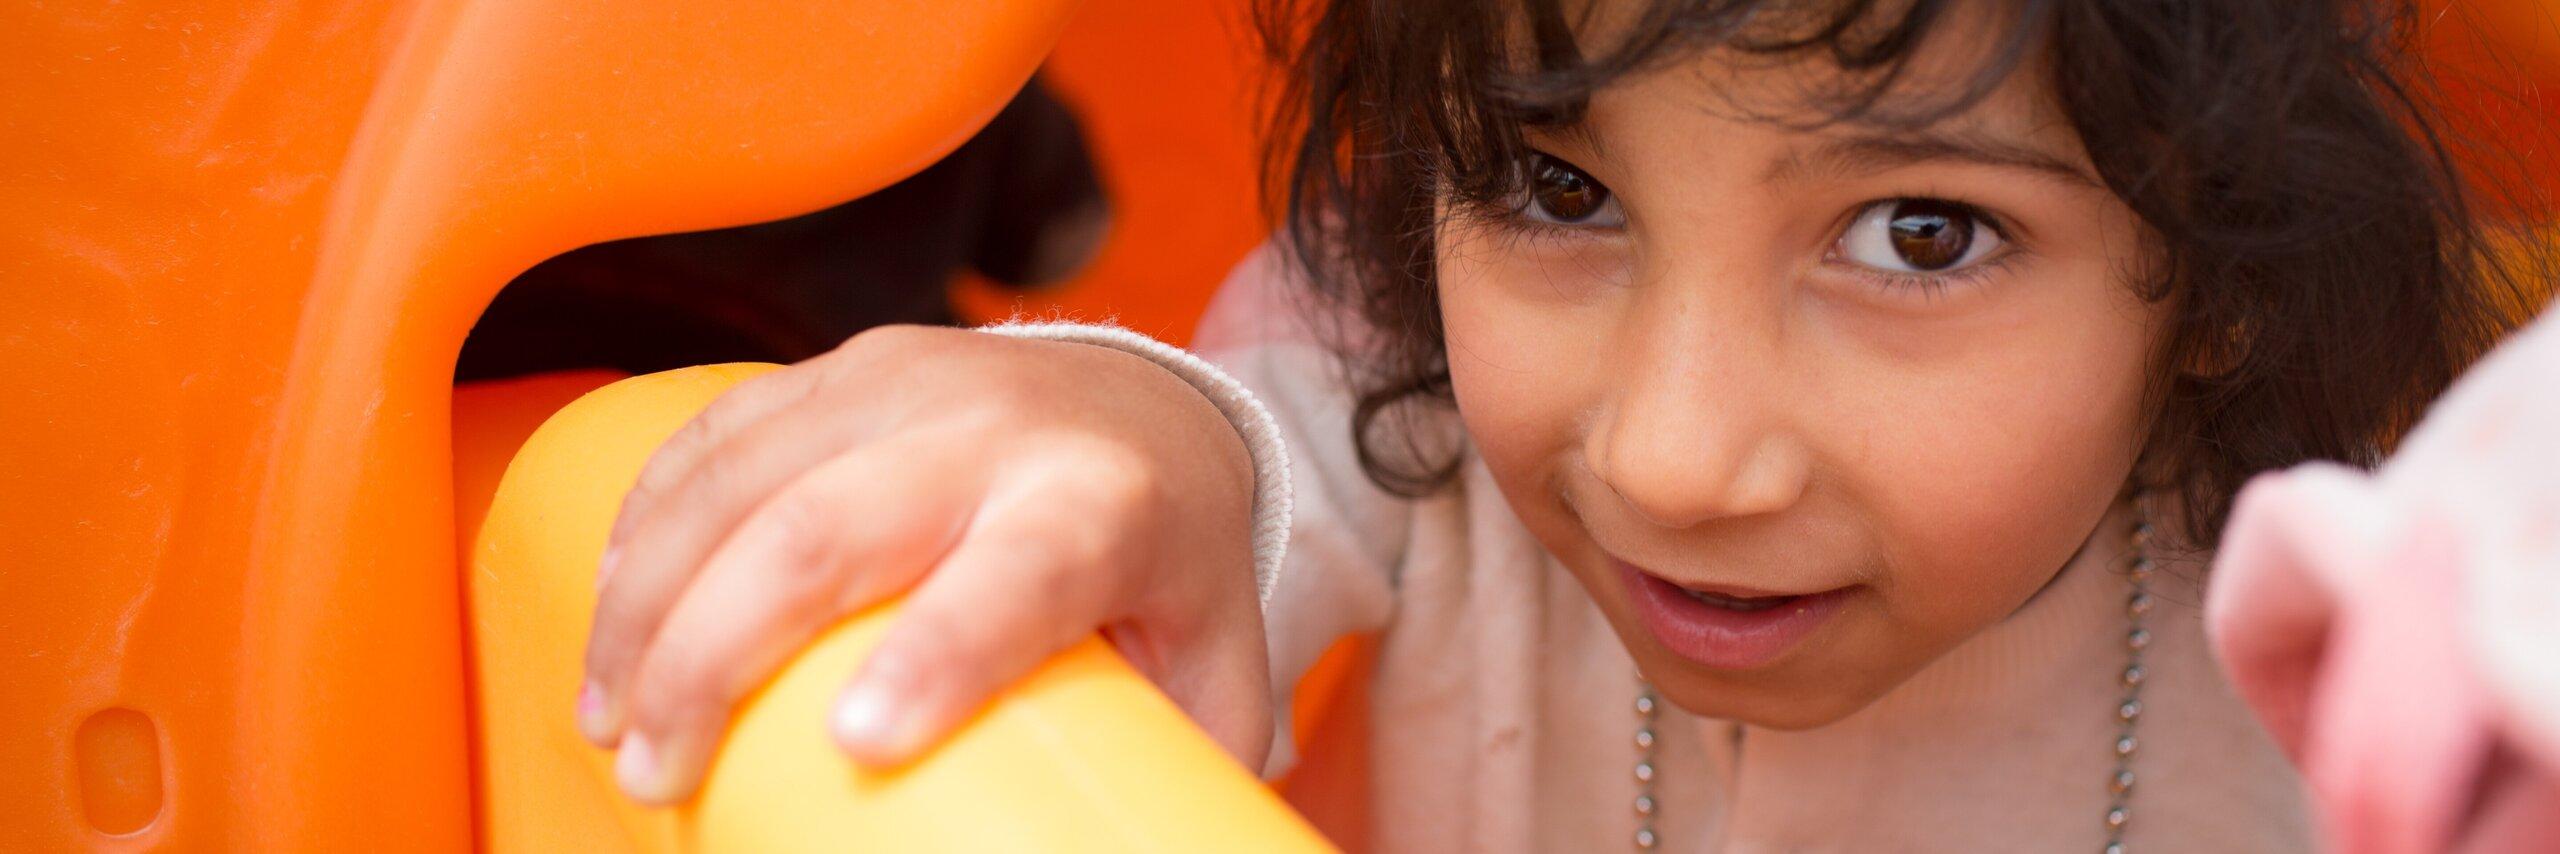 Refugee child in Jordan